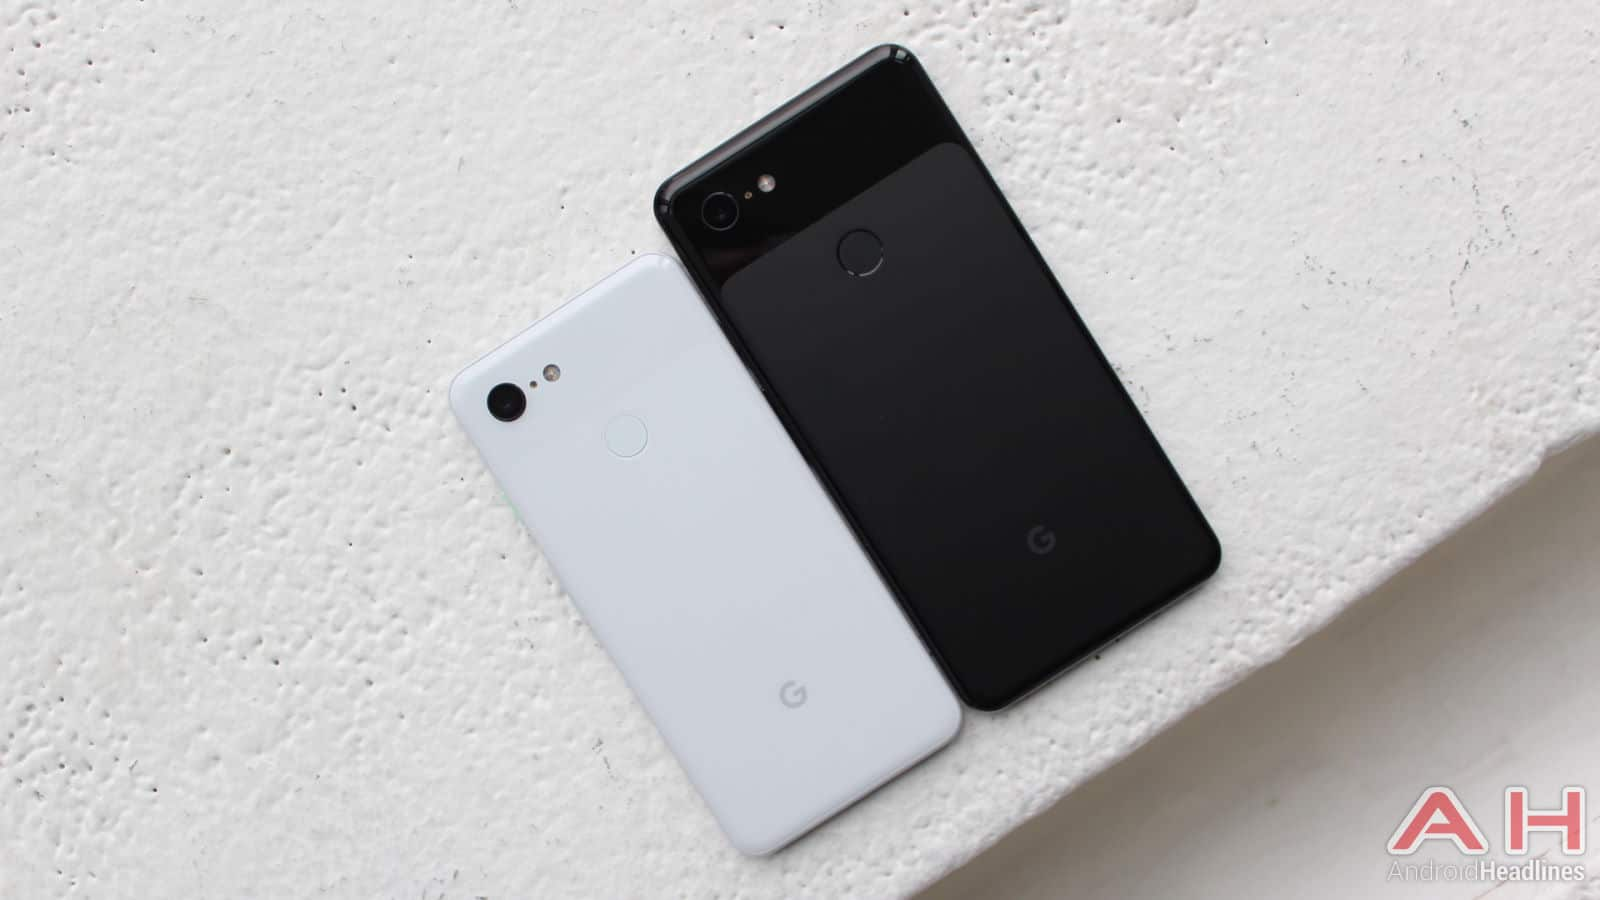 Google Pixel 3 3 XL Hands On AH 5